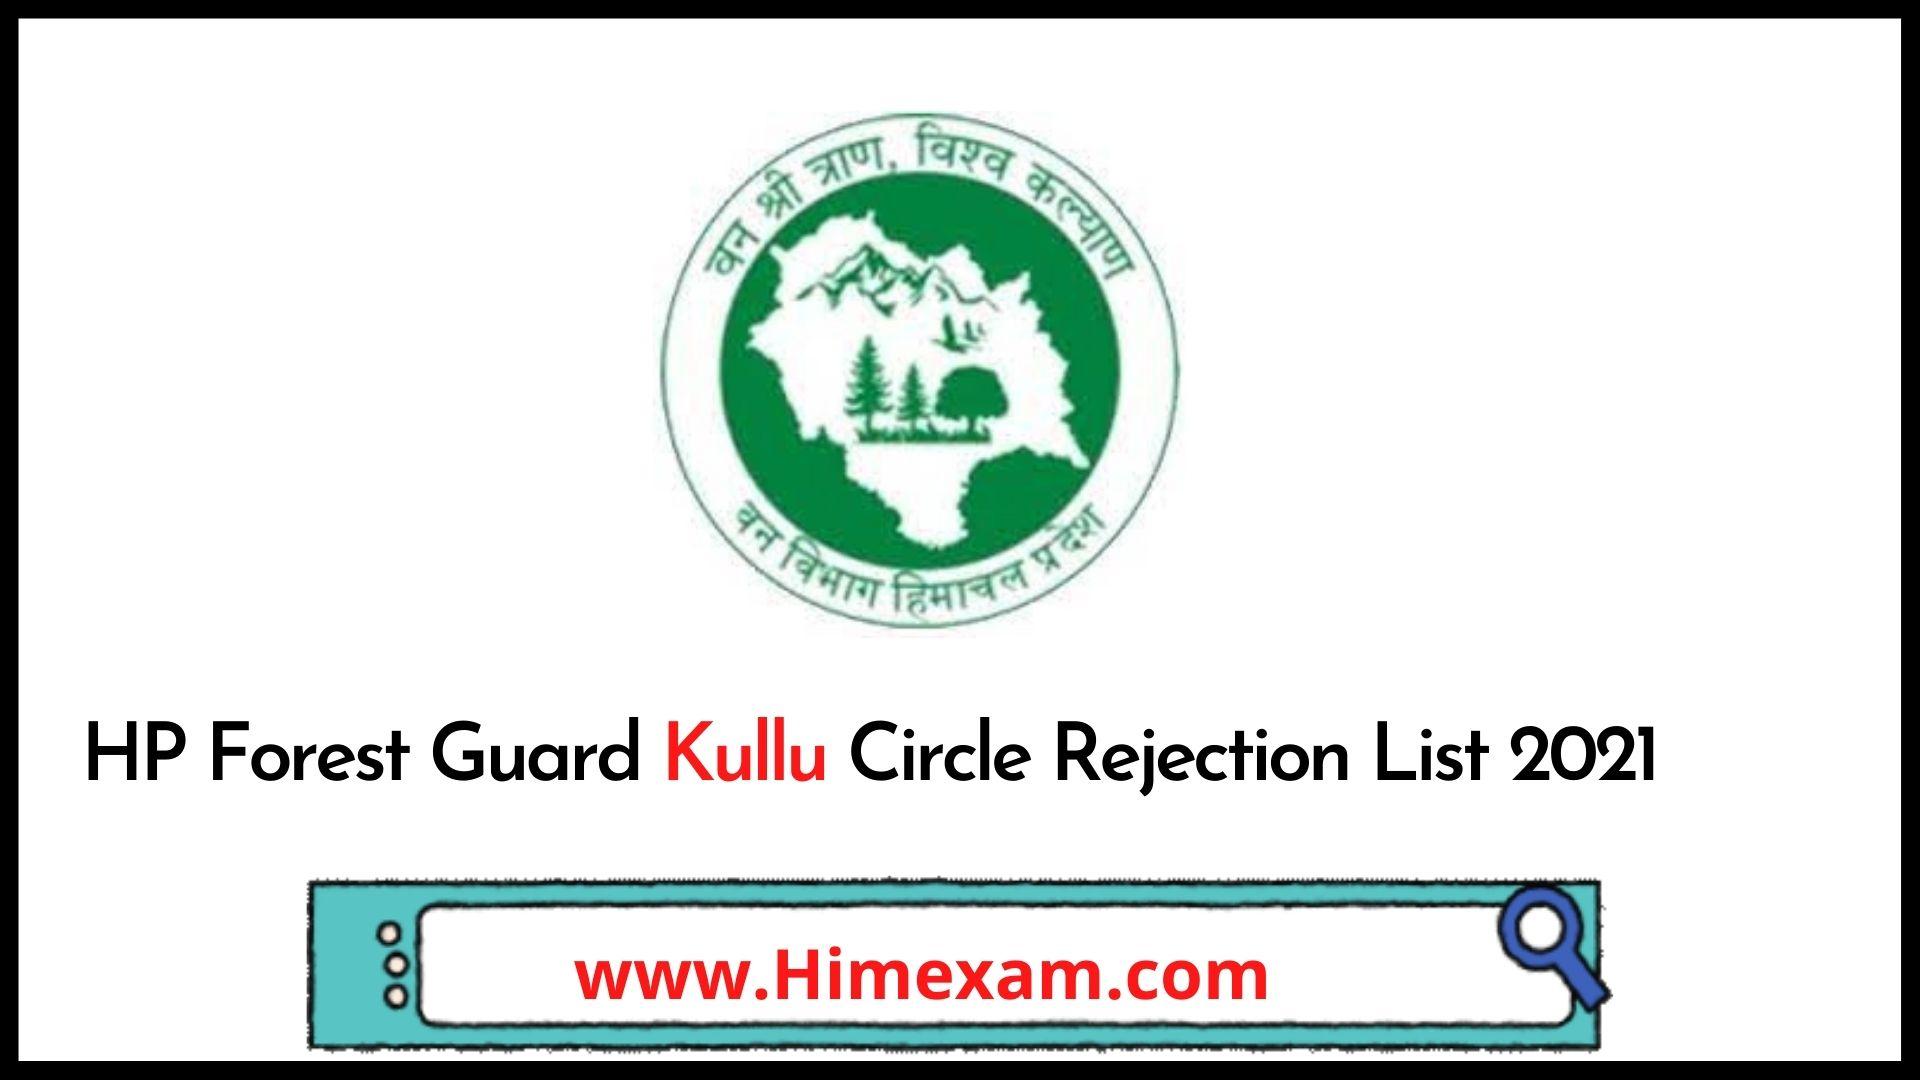 HP Forest Guard Kullu Circle Rejection List 2021